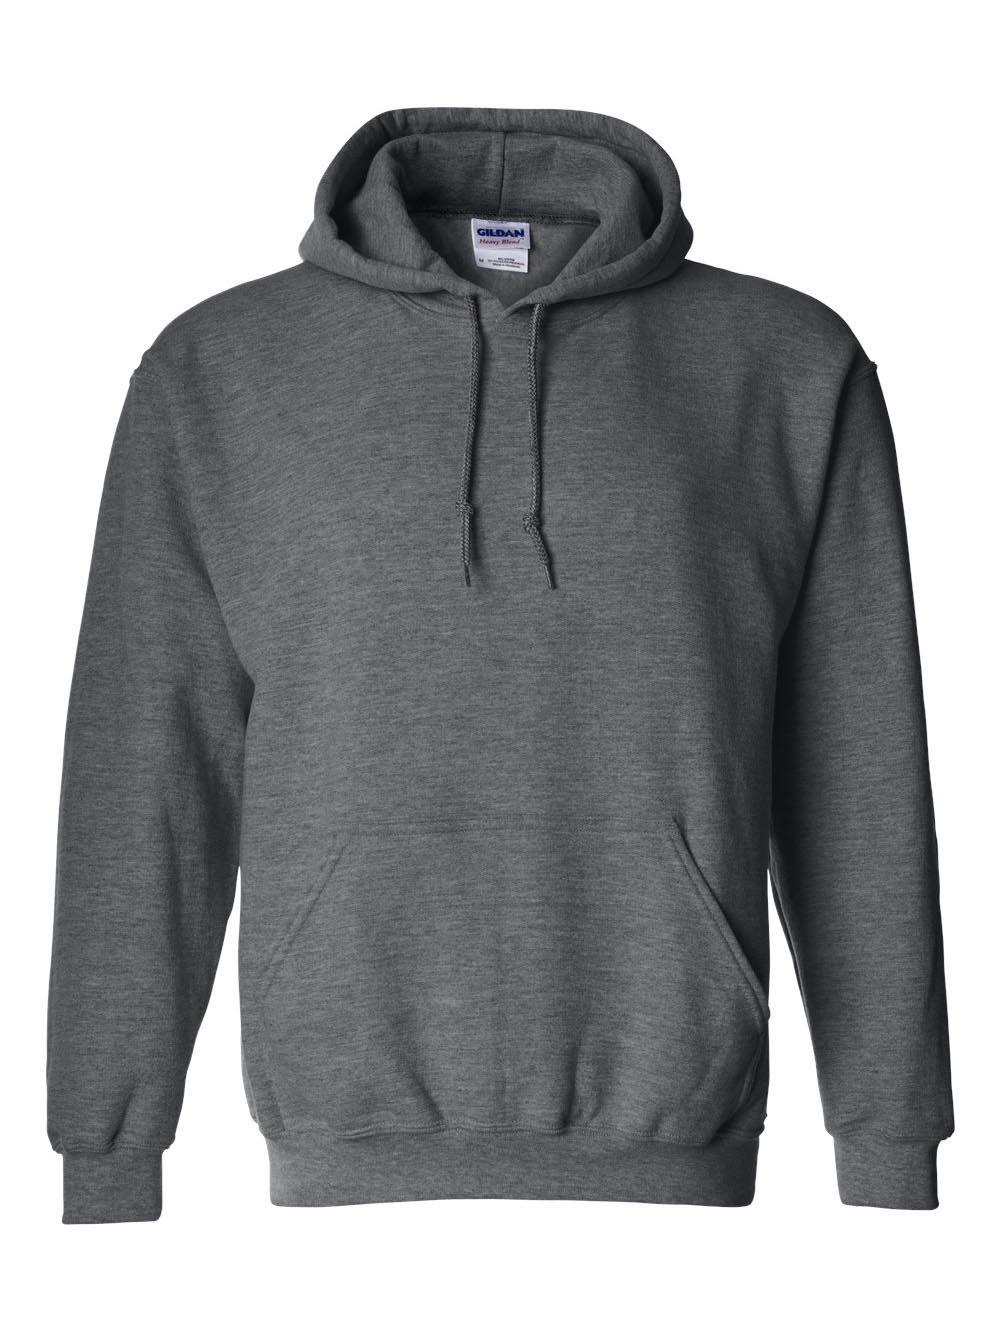 Gildan Men's Big and Tall Heavy Blend Fleece Hooded Sweatshirt G18500, Dark Heather, XX-Large